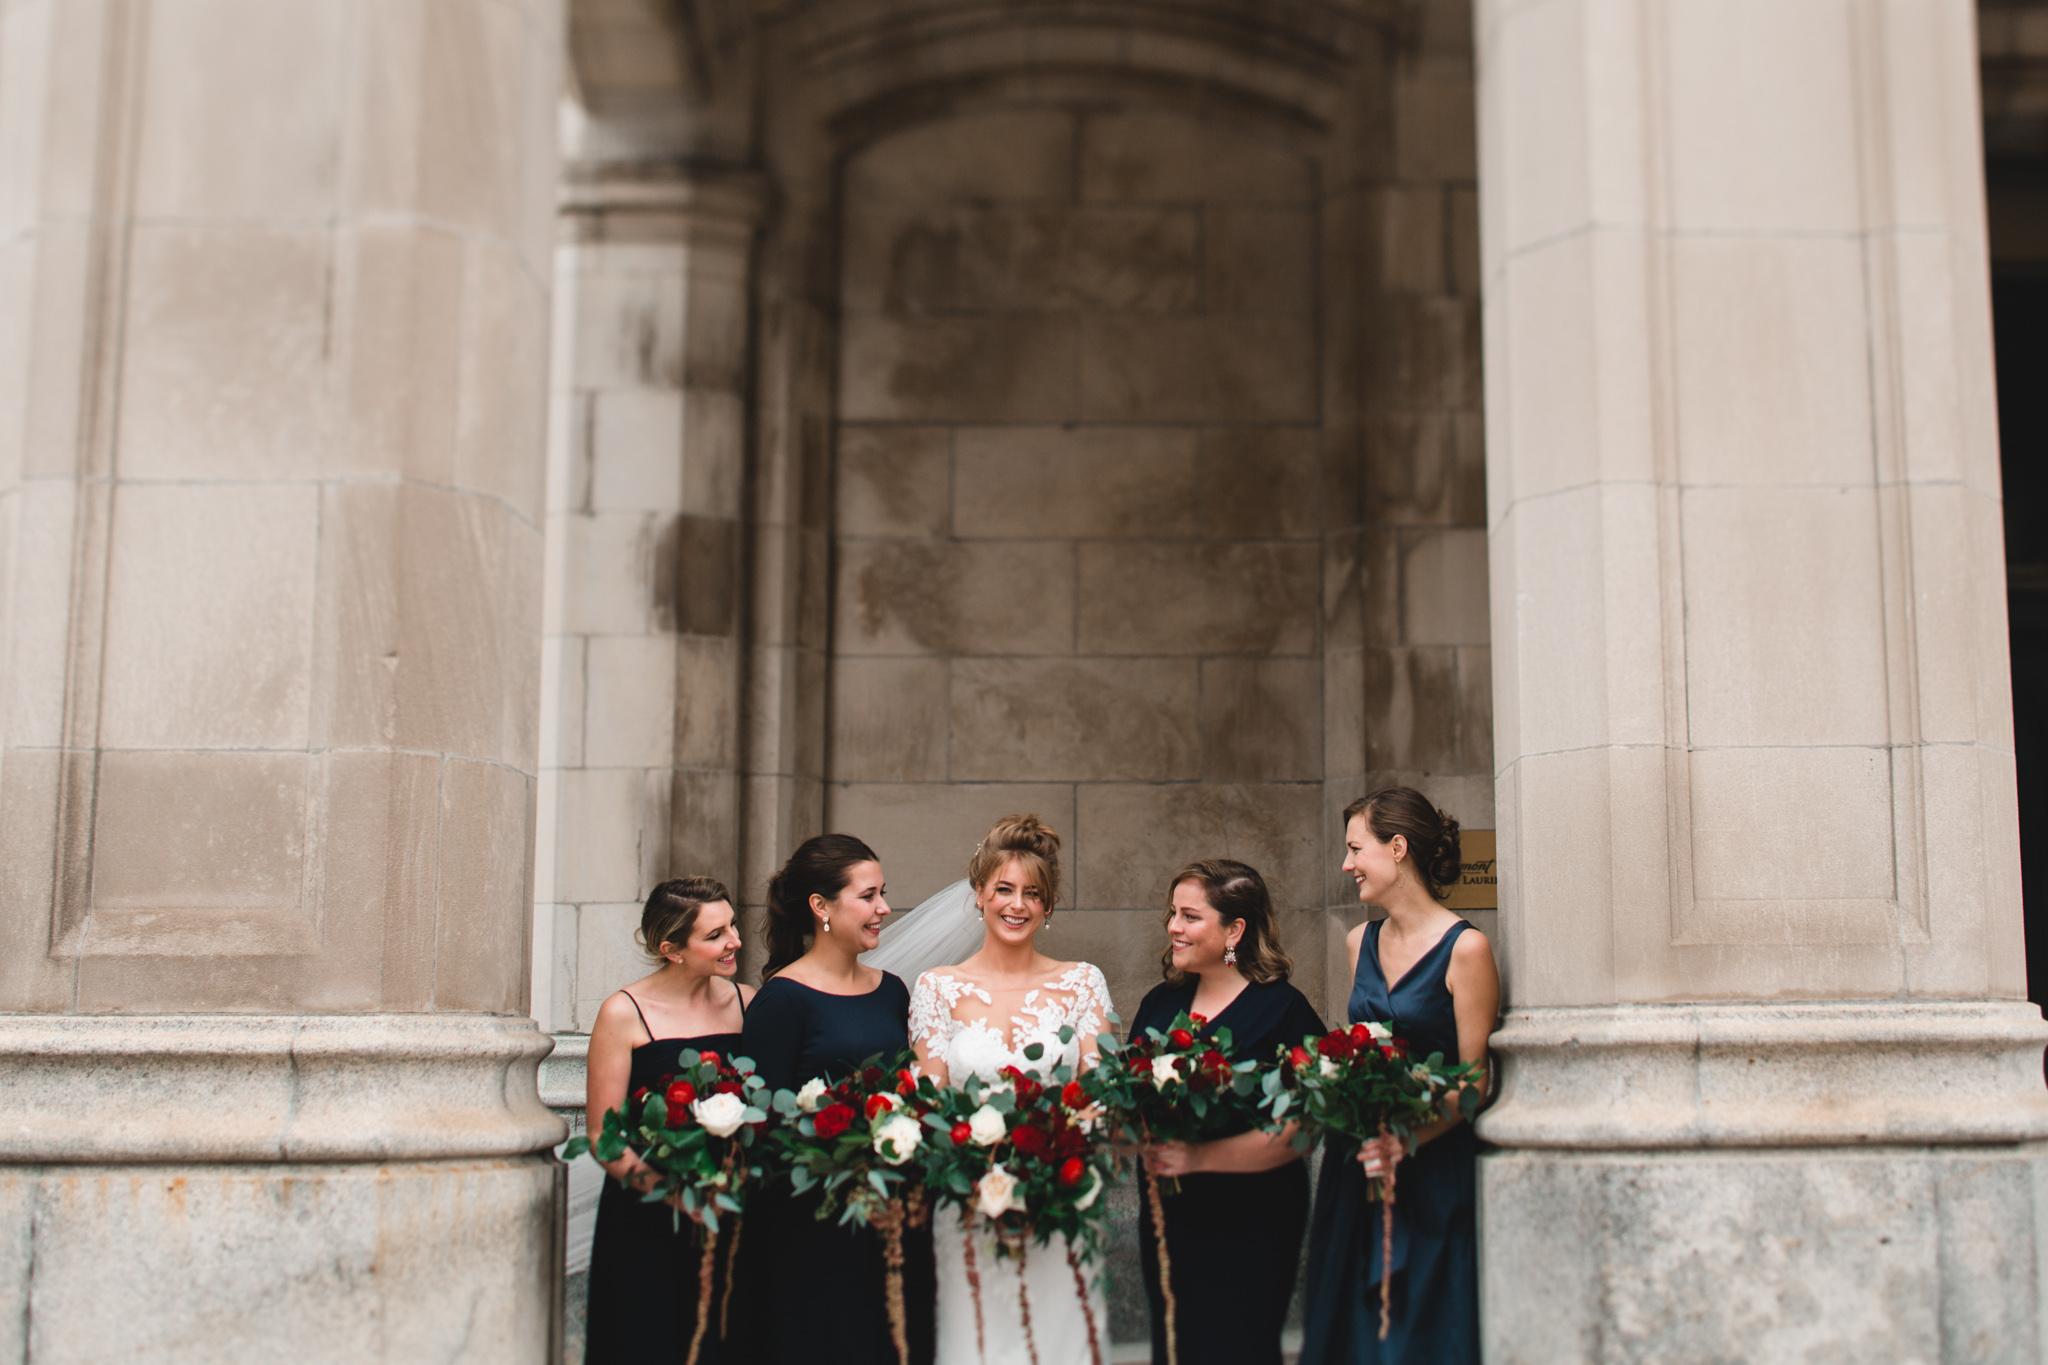 Navy Blue Bridesmaid Dresses, mismatching